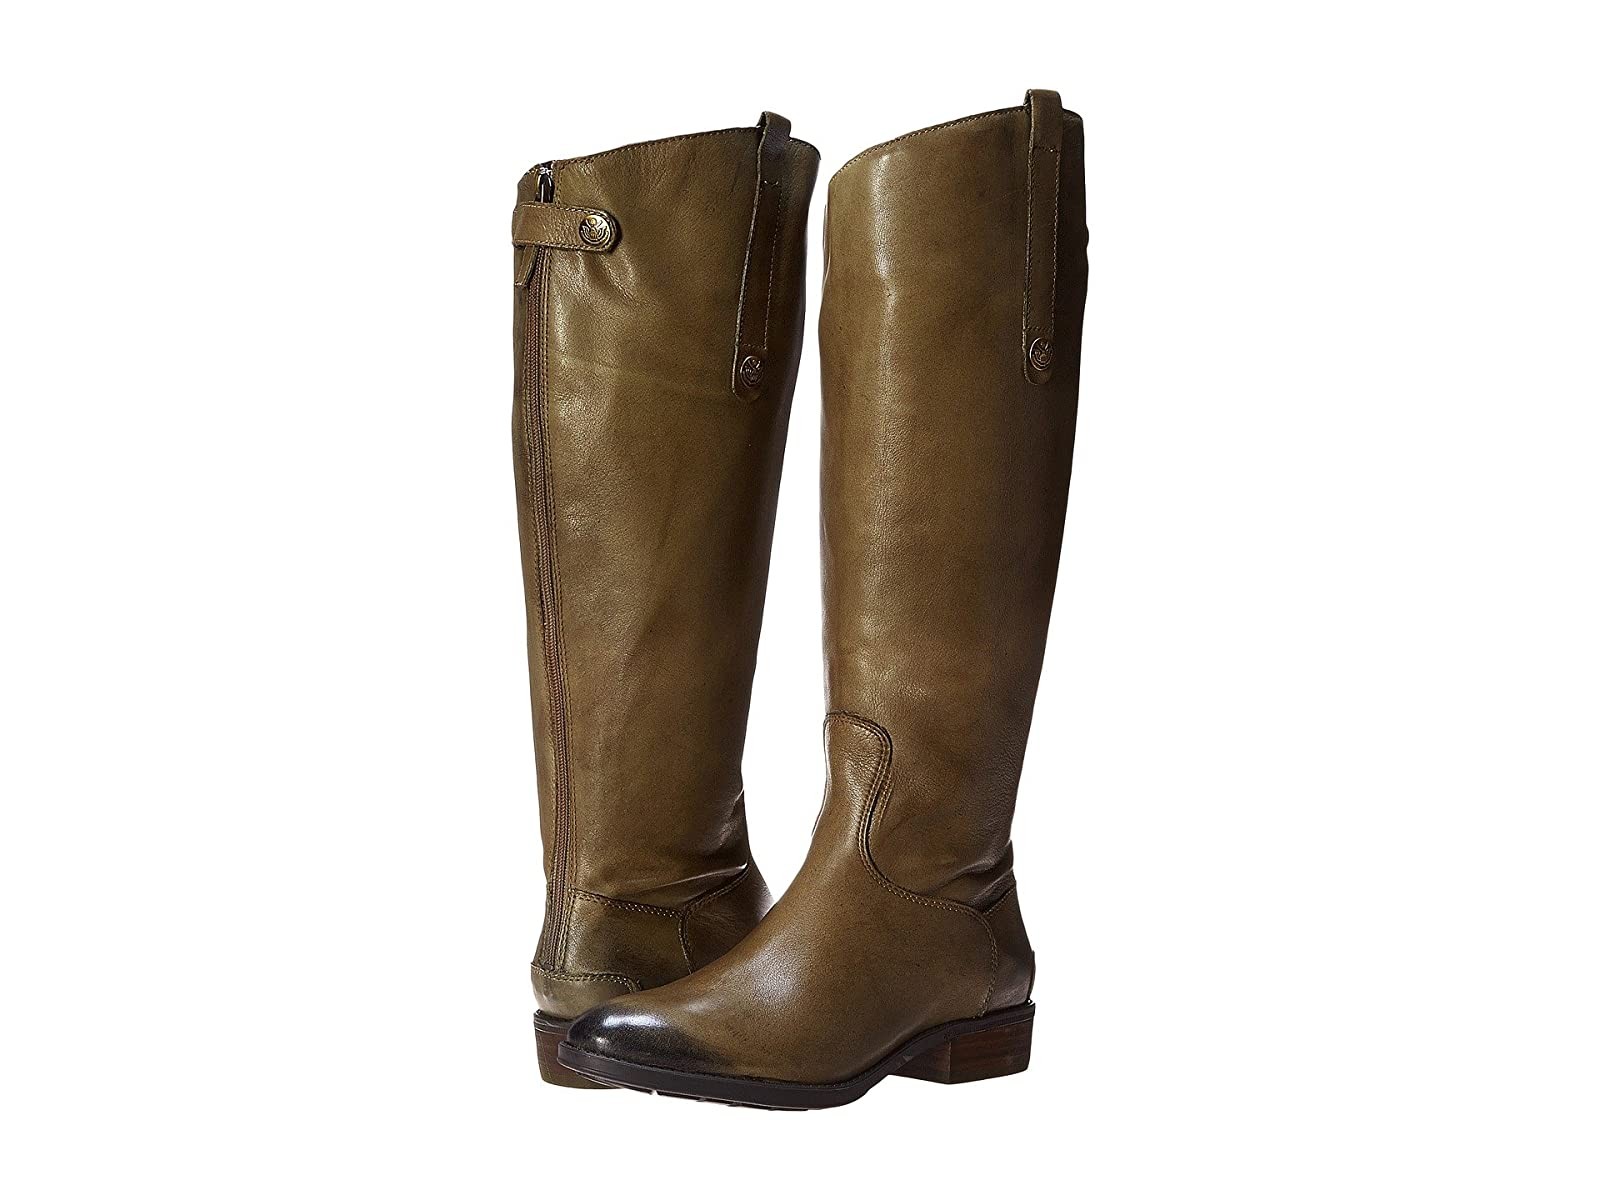 Sam Edelman Penny 2 Wide CalfEconomical and quality shoes